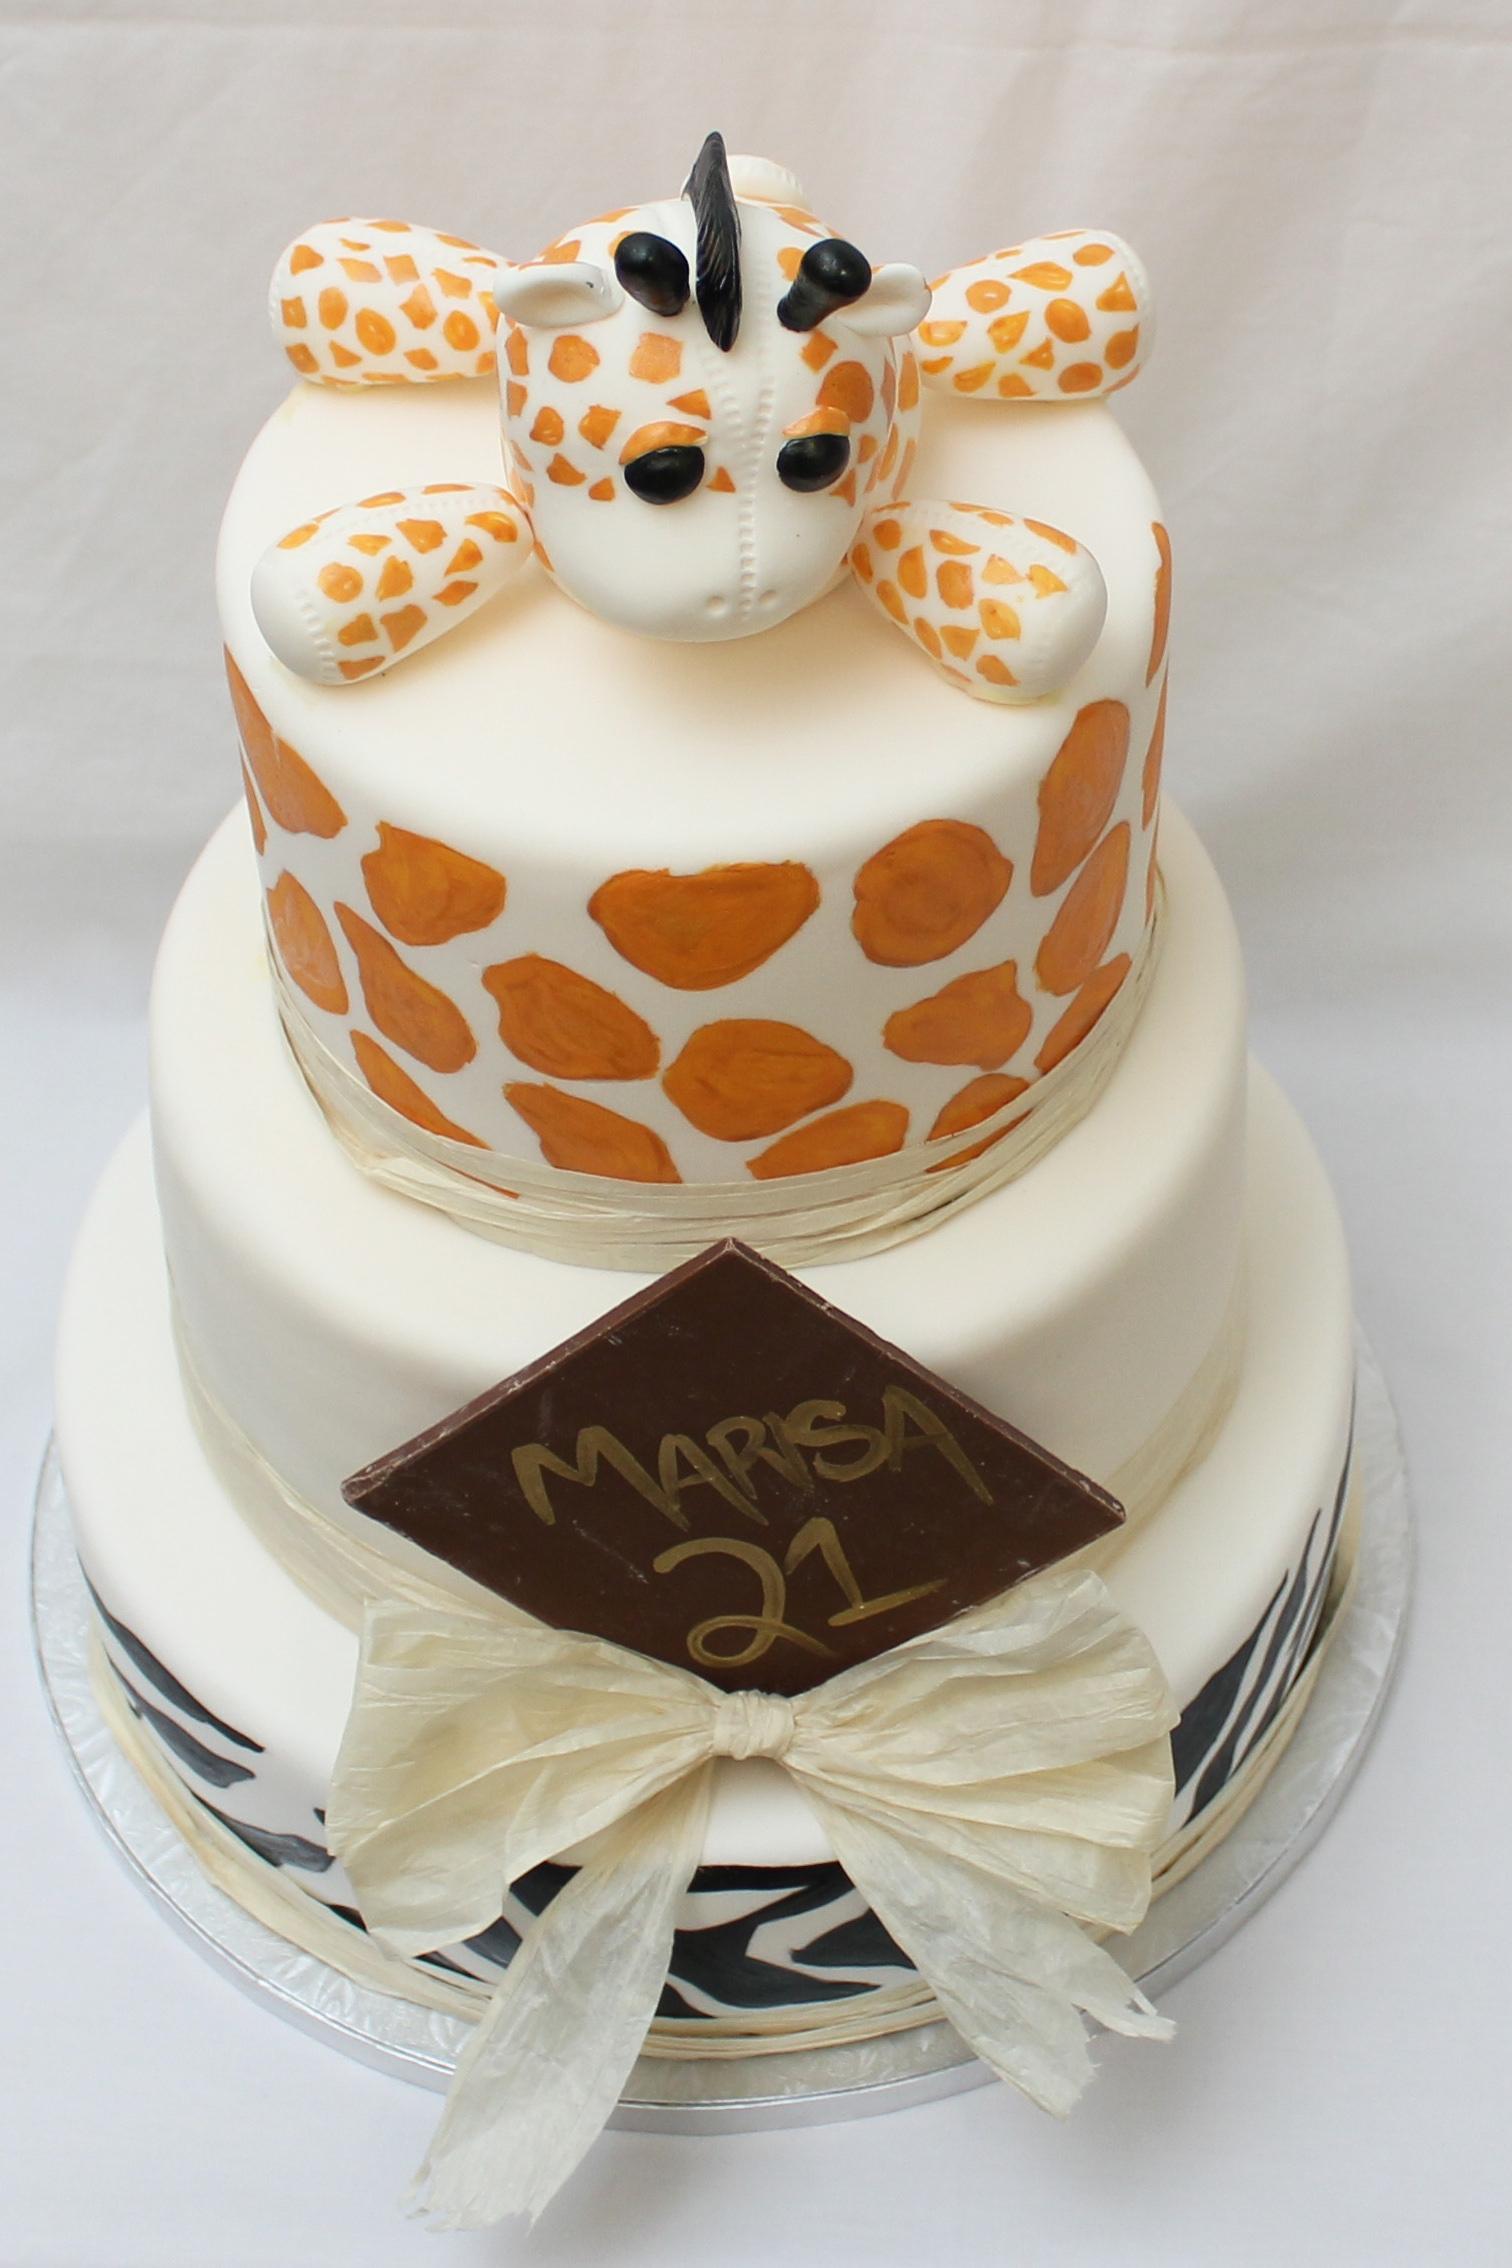 2 Tier Unicorn Birthday Cake - celticcakes.com